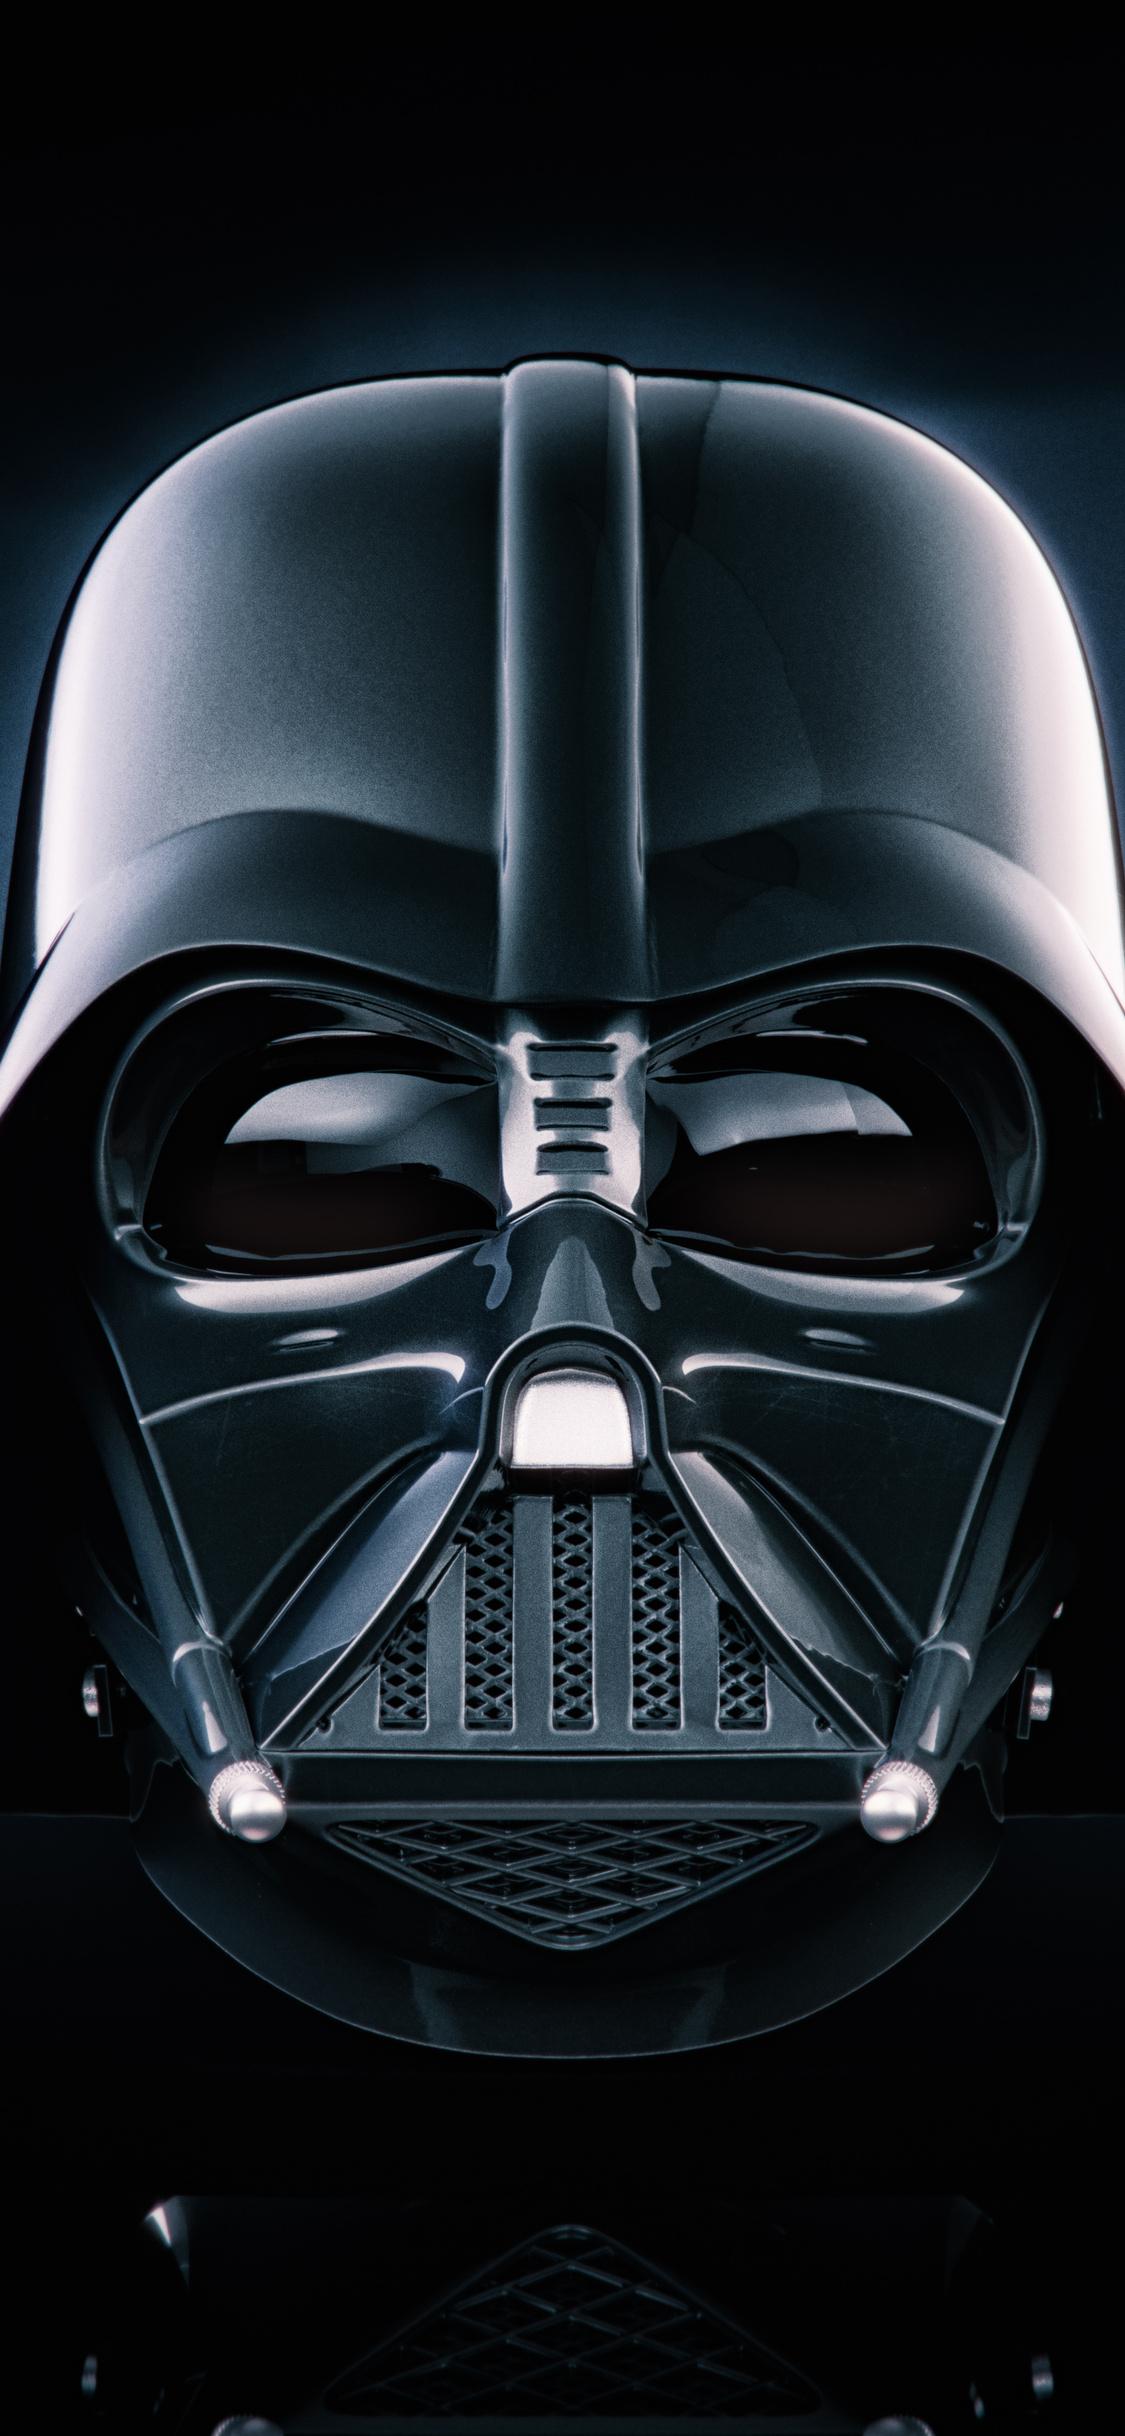 1125x2436 Darth Vader 5k Iphone XS,Iphone 10,Iphone X HD ...